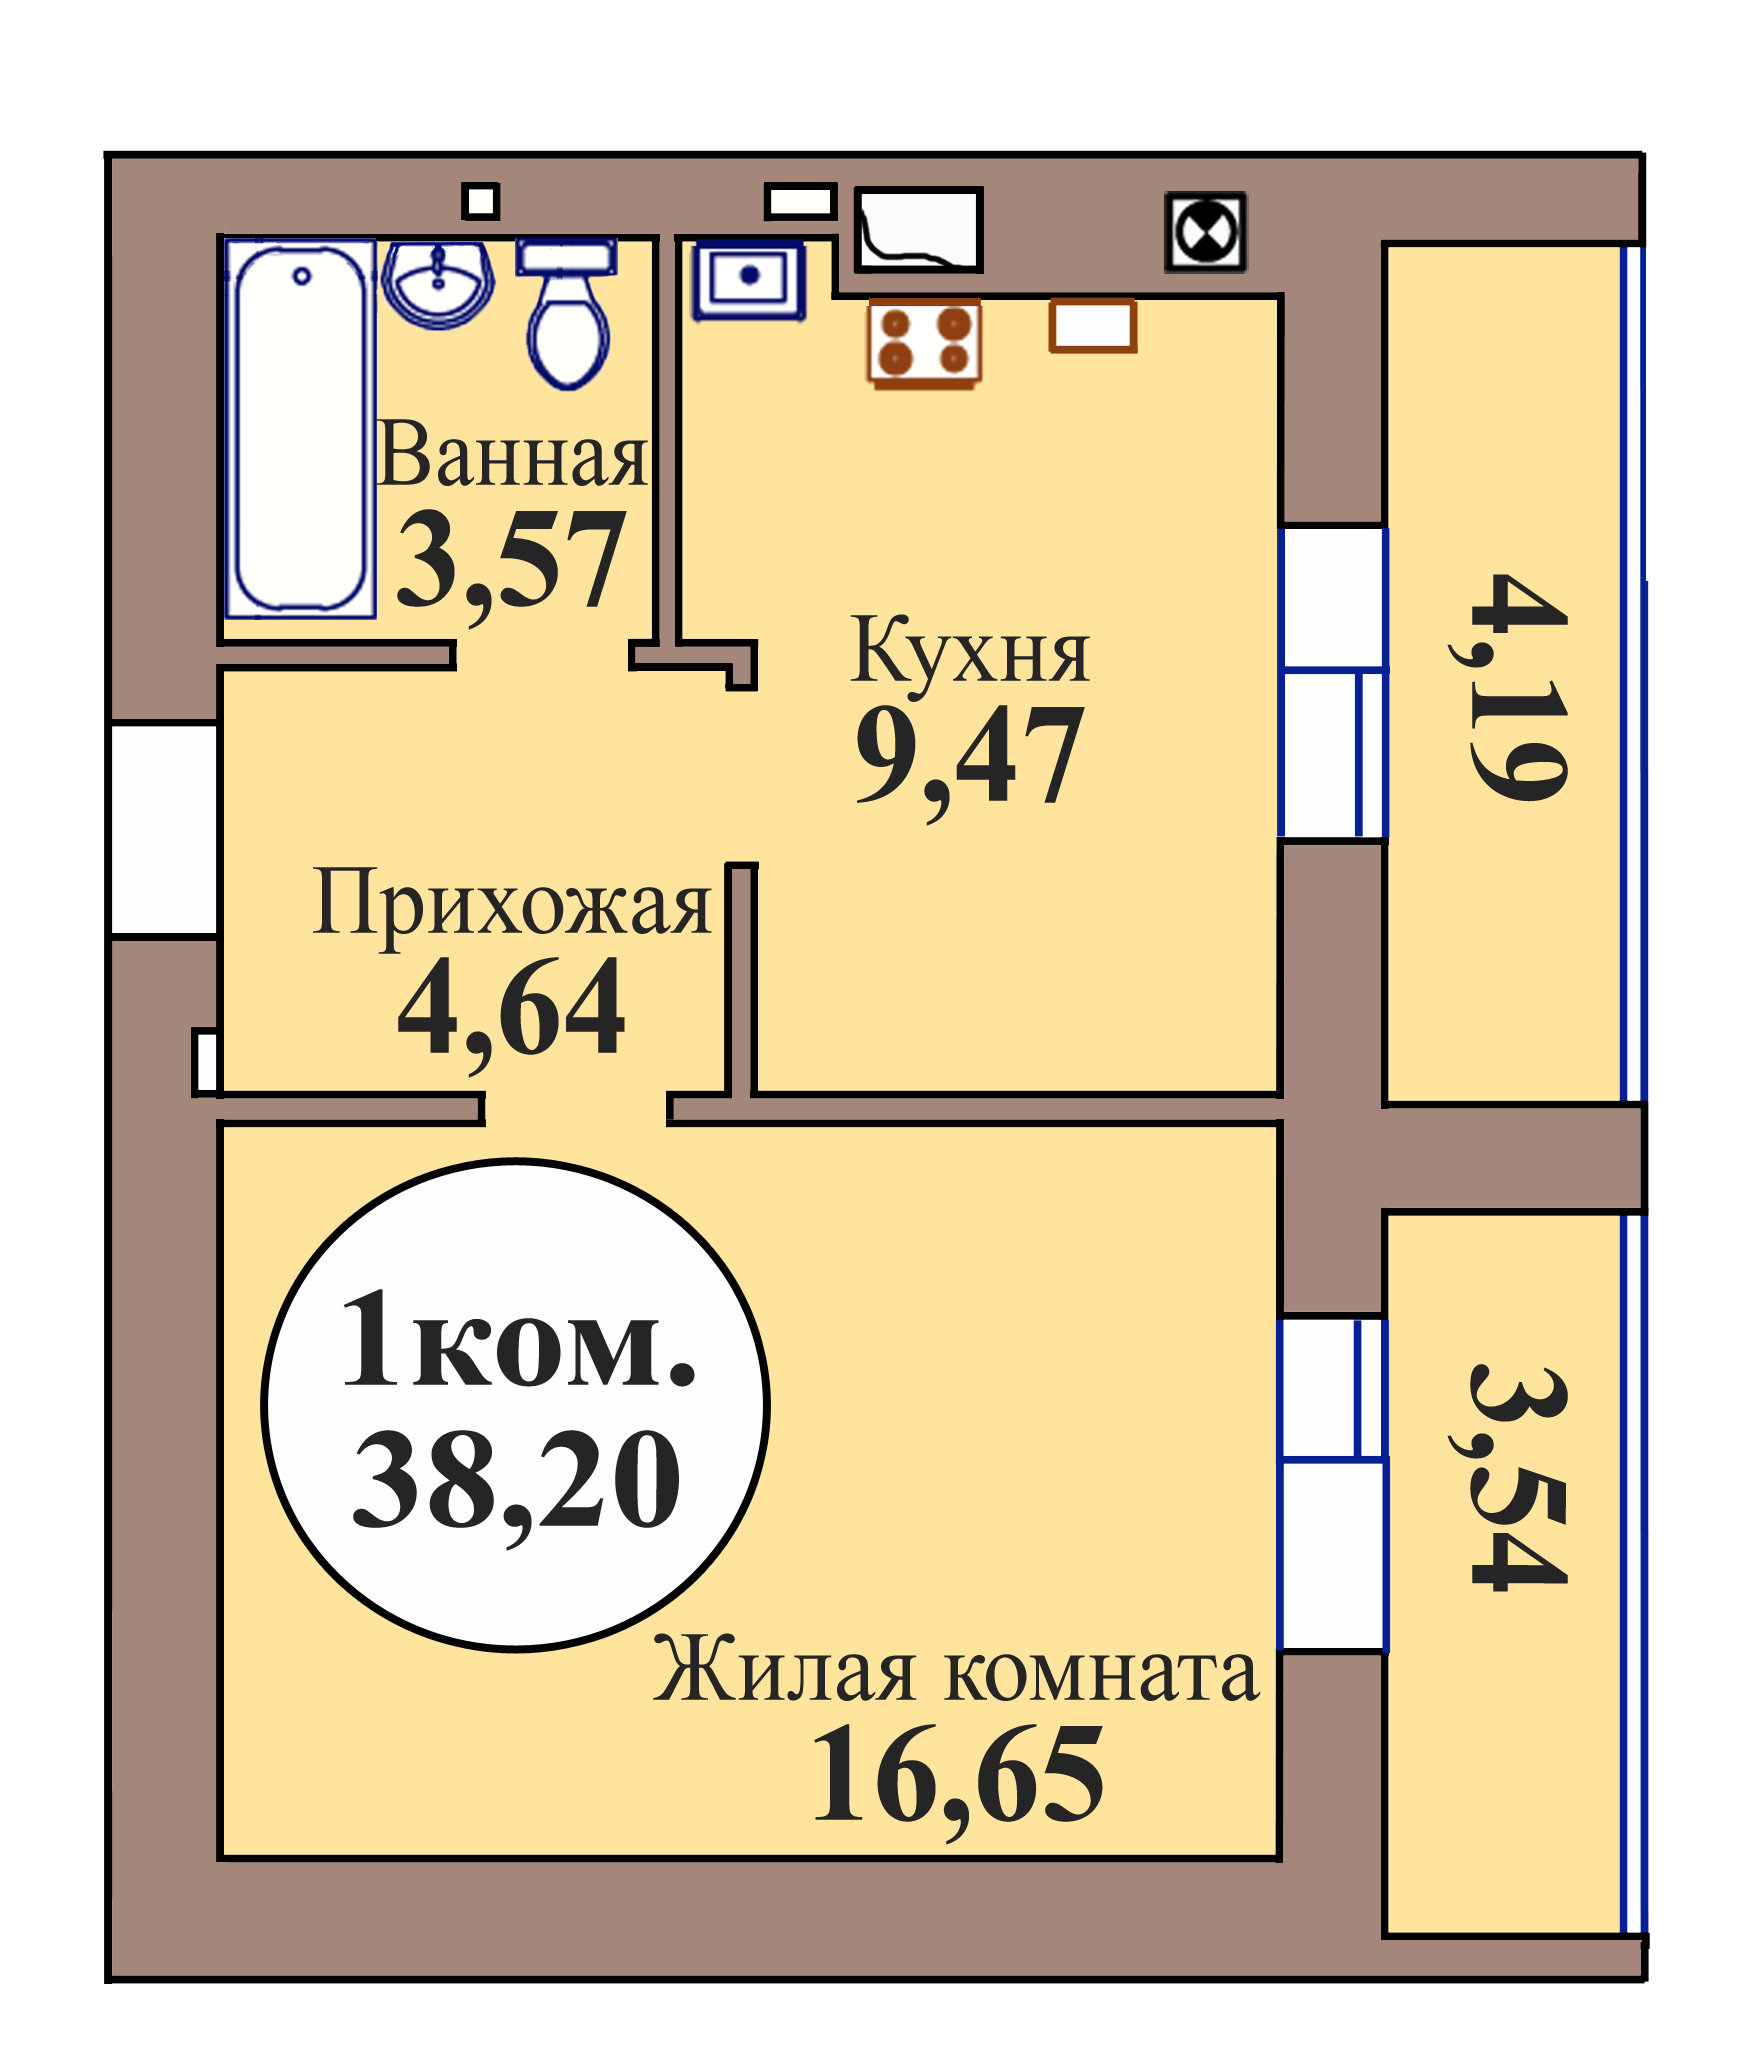 1-комн. кв. по ГП дом №3, МКР Васильково, кв. 41 в Калининграде